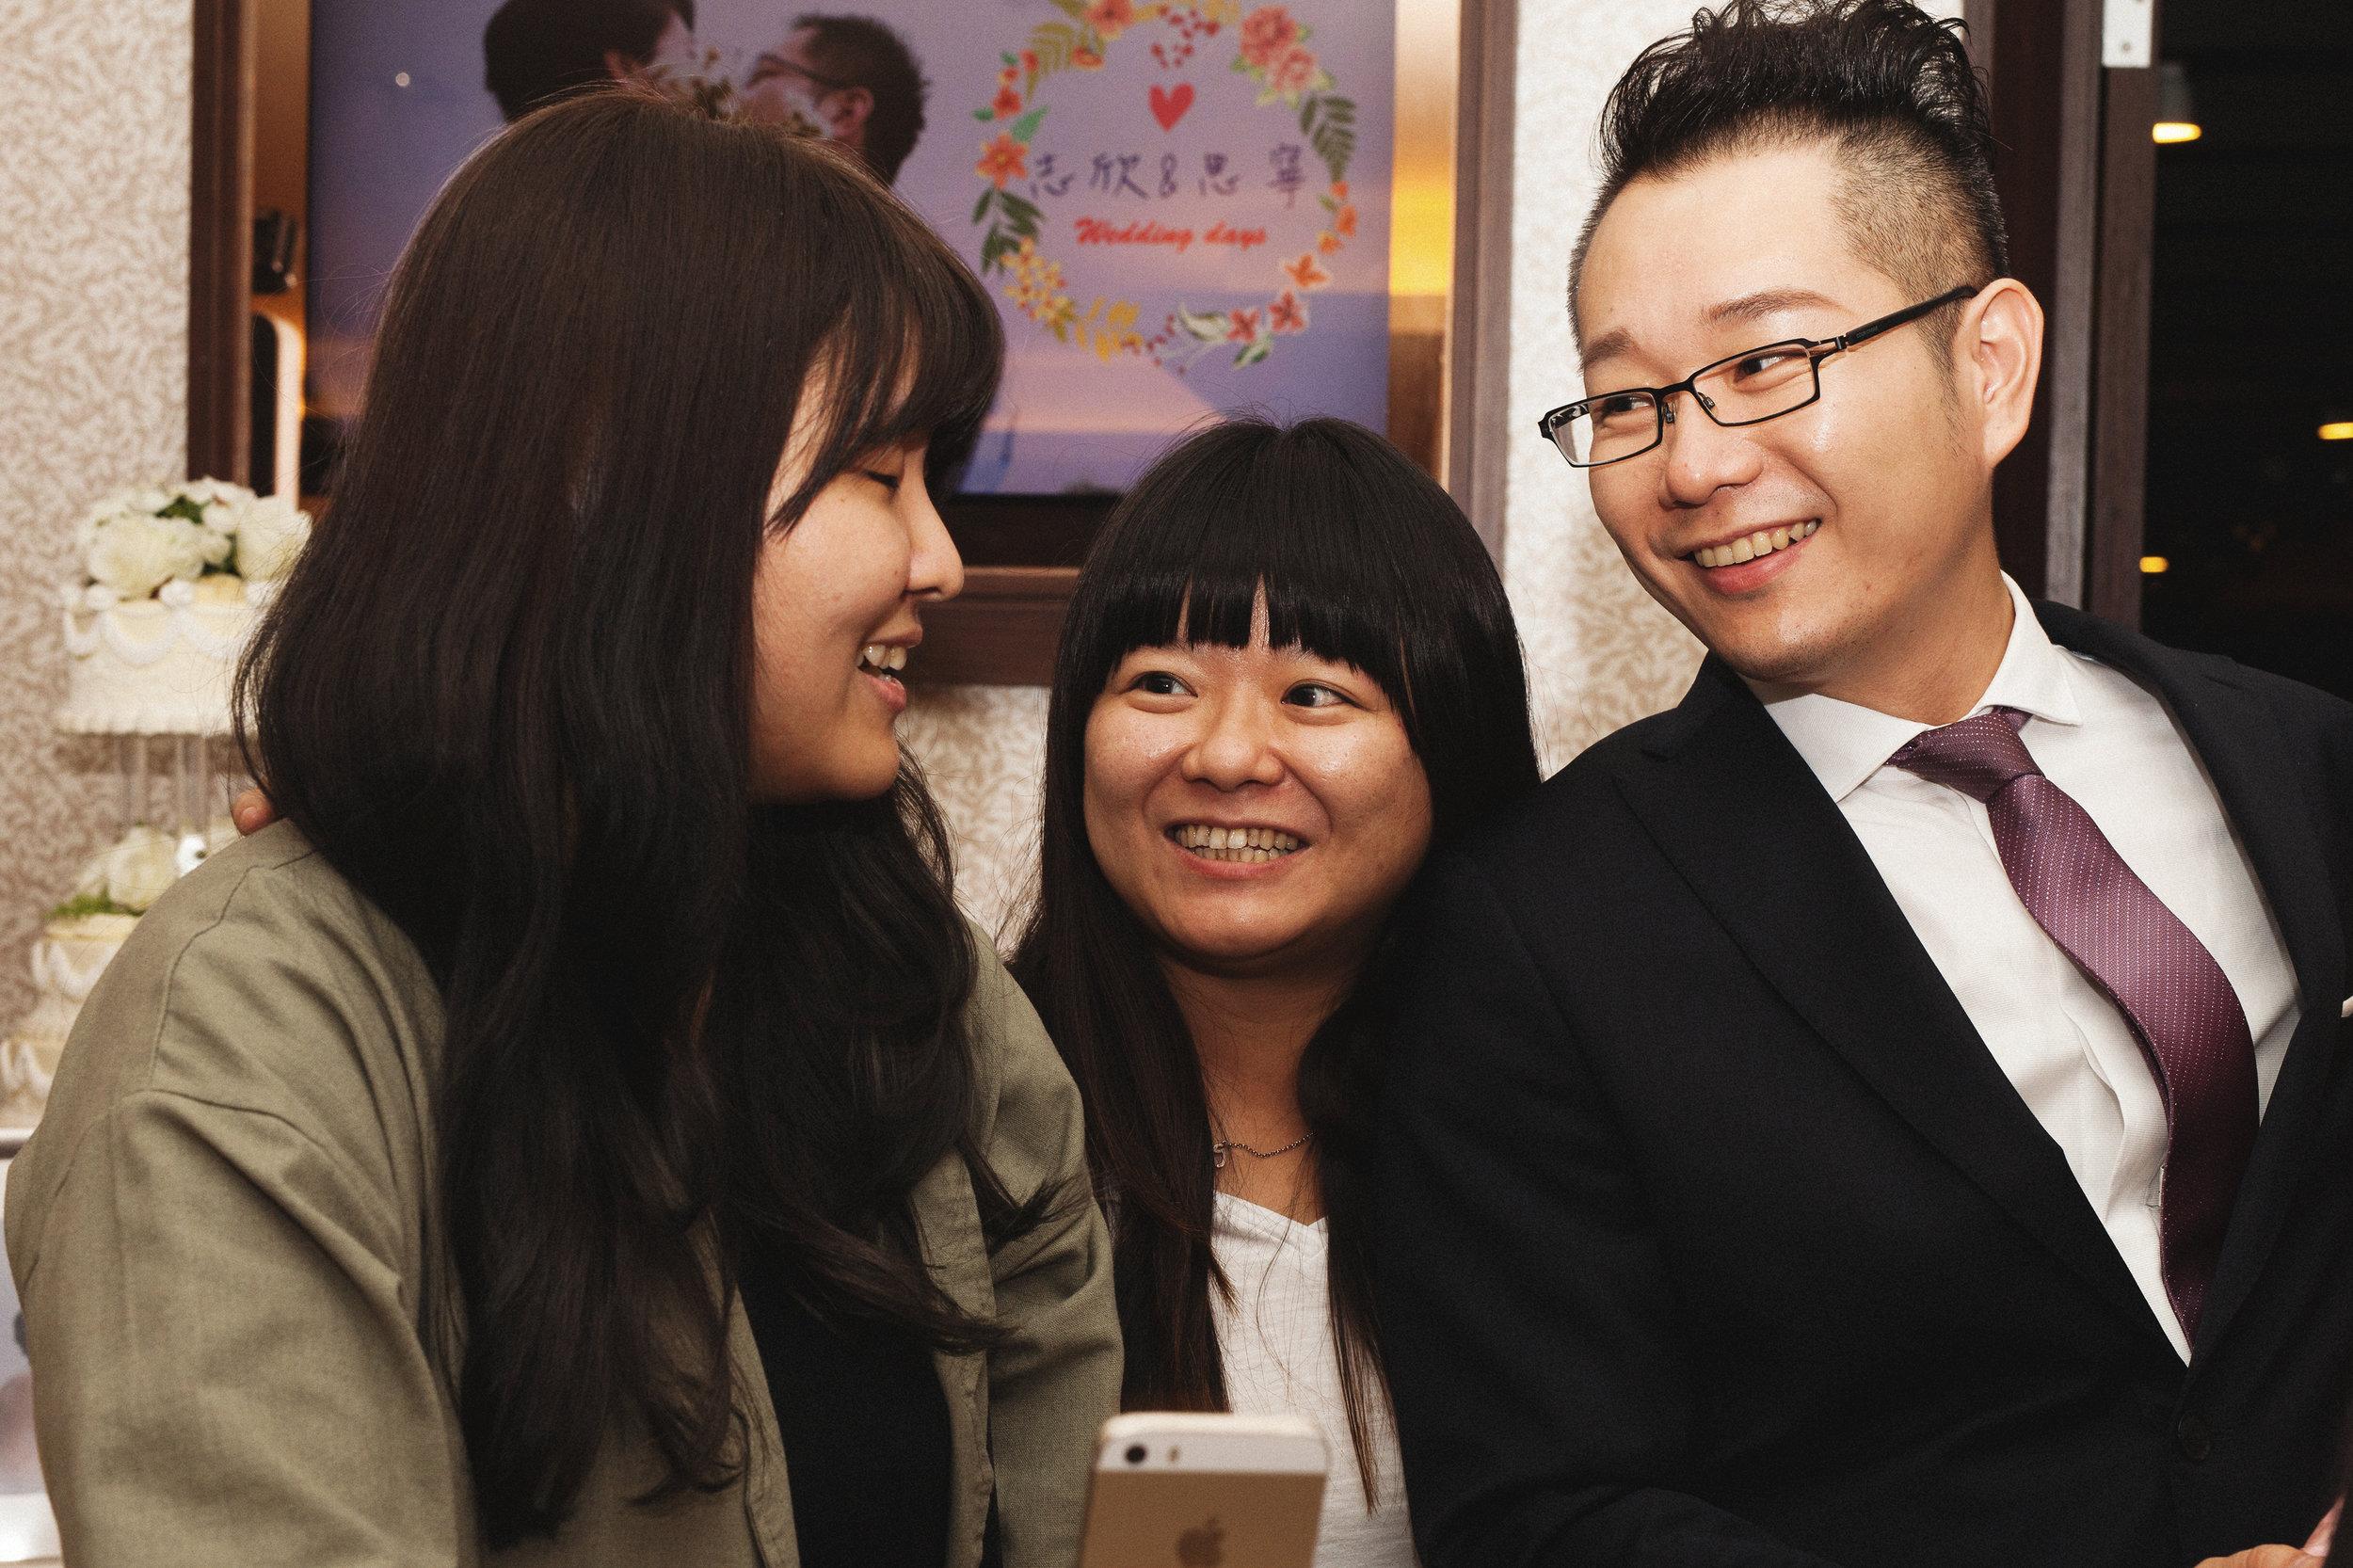 [JC]CREATIVE 女性攝影師 北投儷宴會館 補請台灣WEDDING    自然風格 台北婚攝推 女婚攝  桃園婚攝   圖像00406.JPG